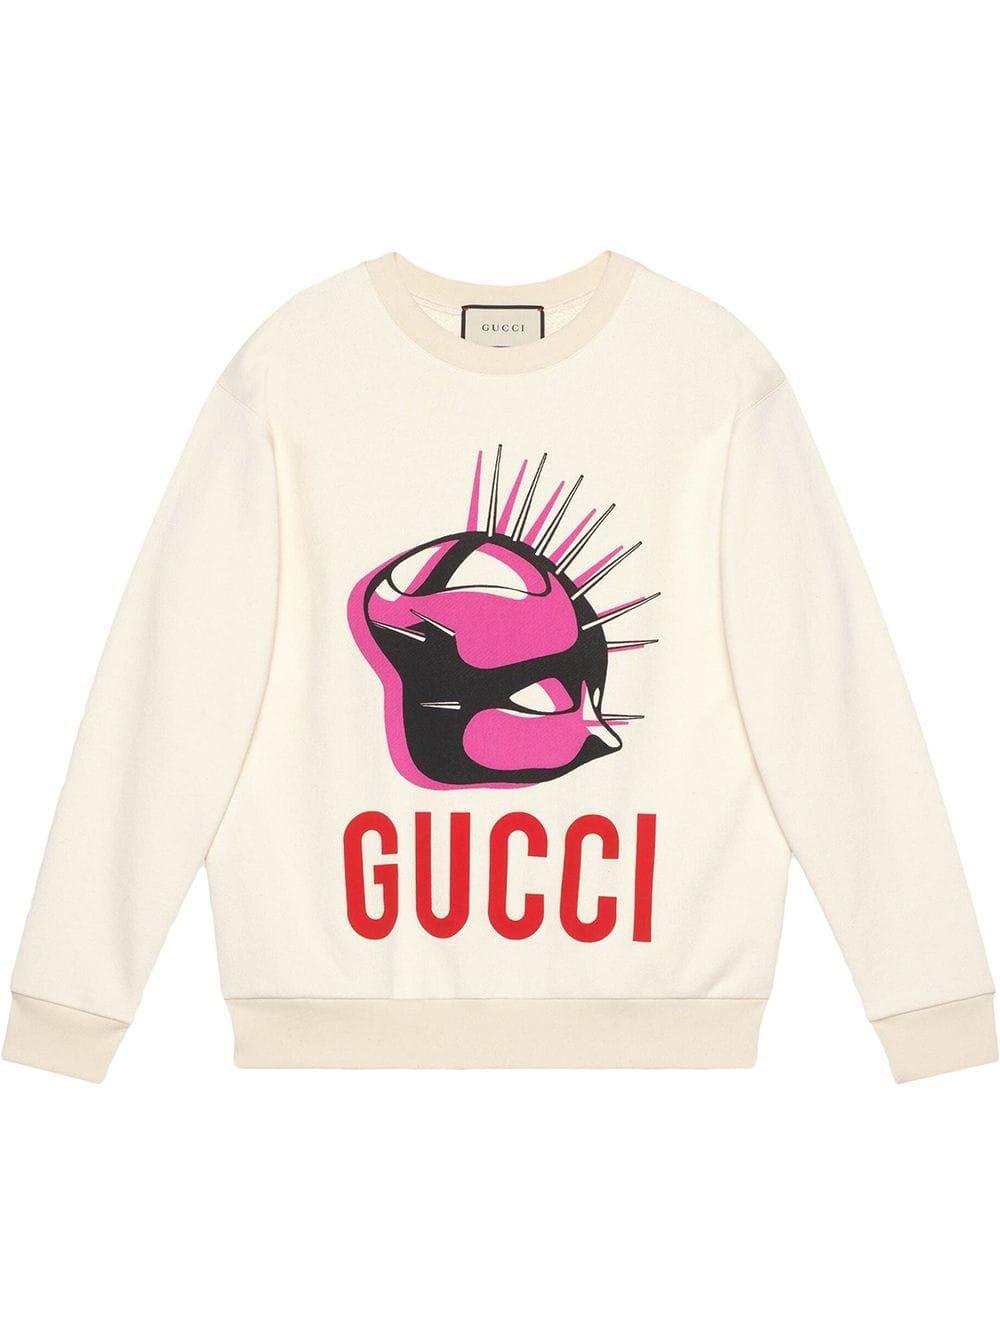 Gucci Manifesto Oversized Sweatshirt Farfetch Sweatshirts Oversized Sweatshirt Sweatshirt Fashion [ 1334 x 1000 Pixel ]